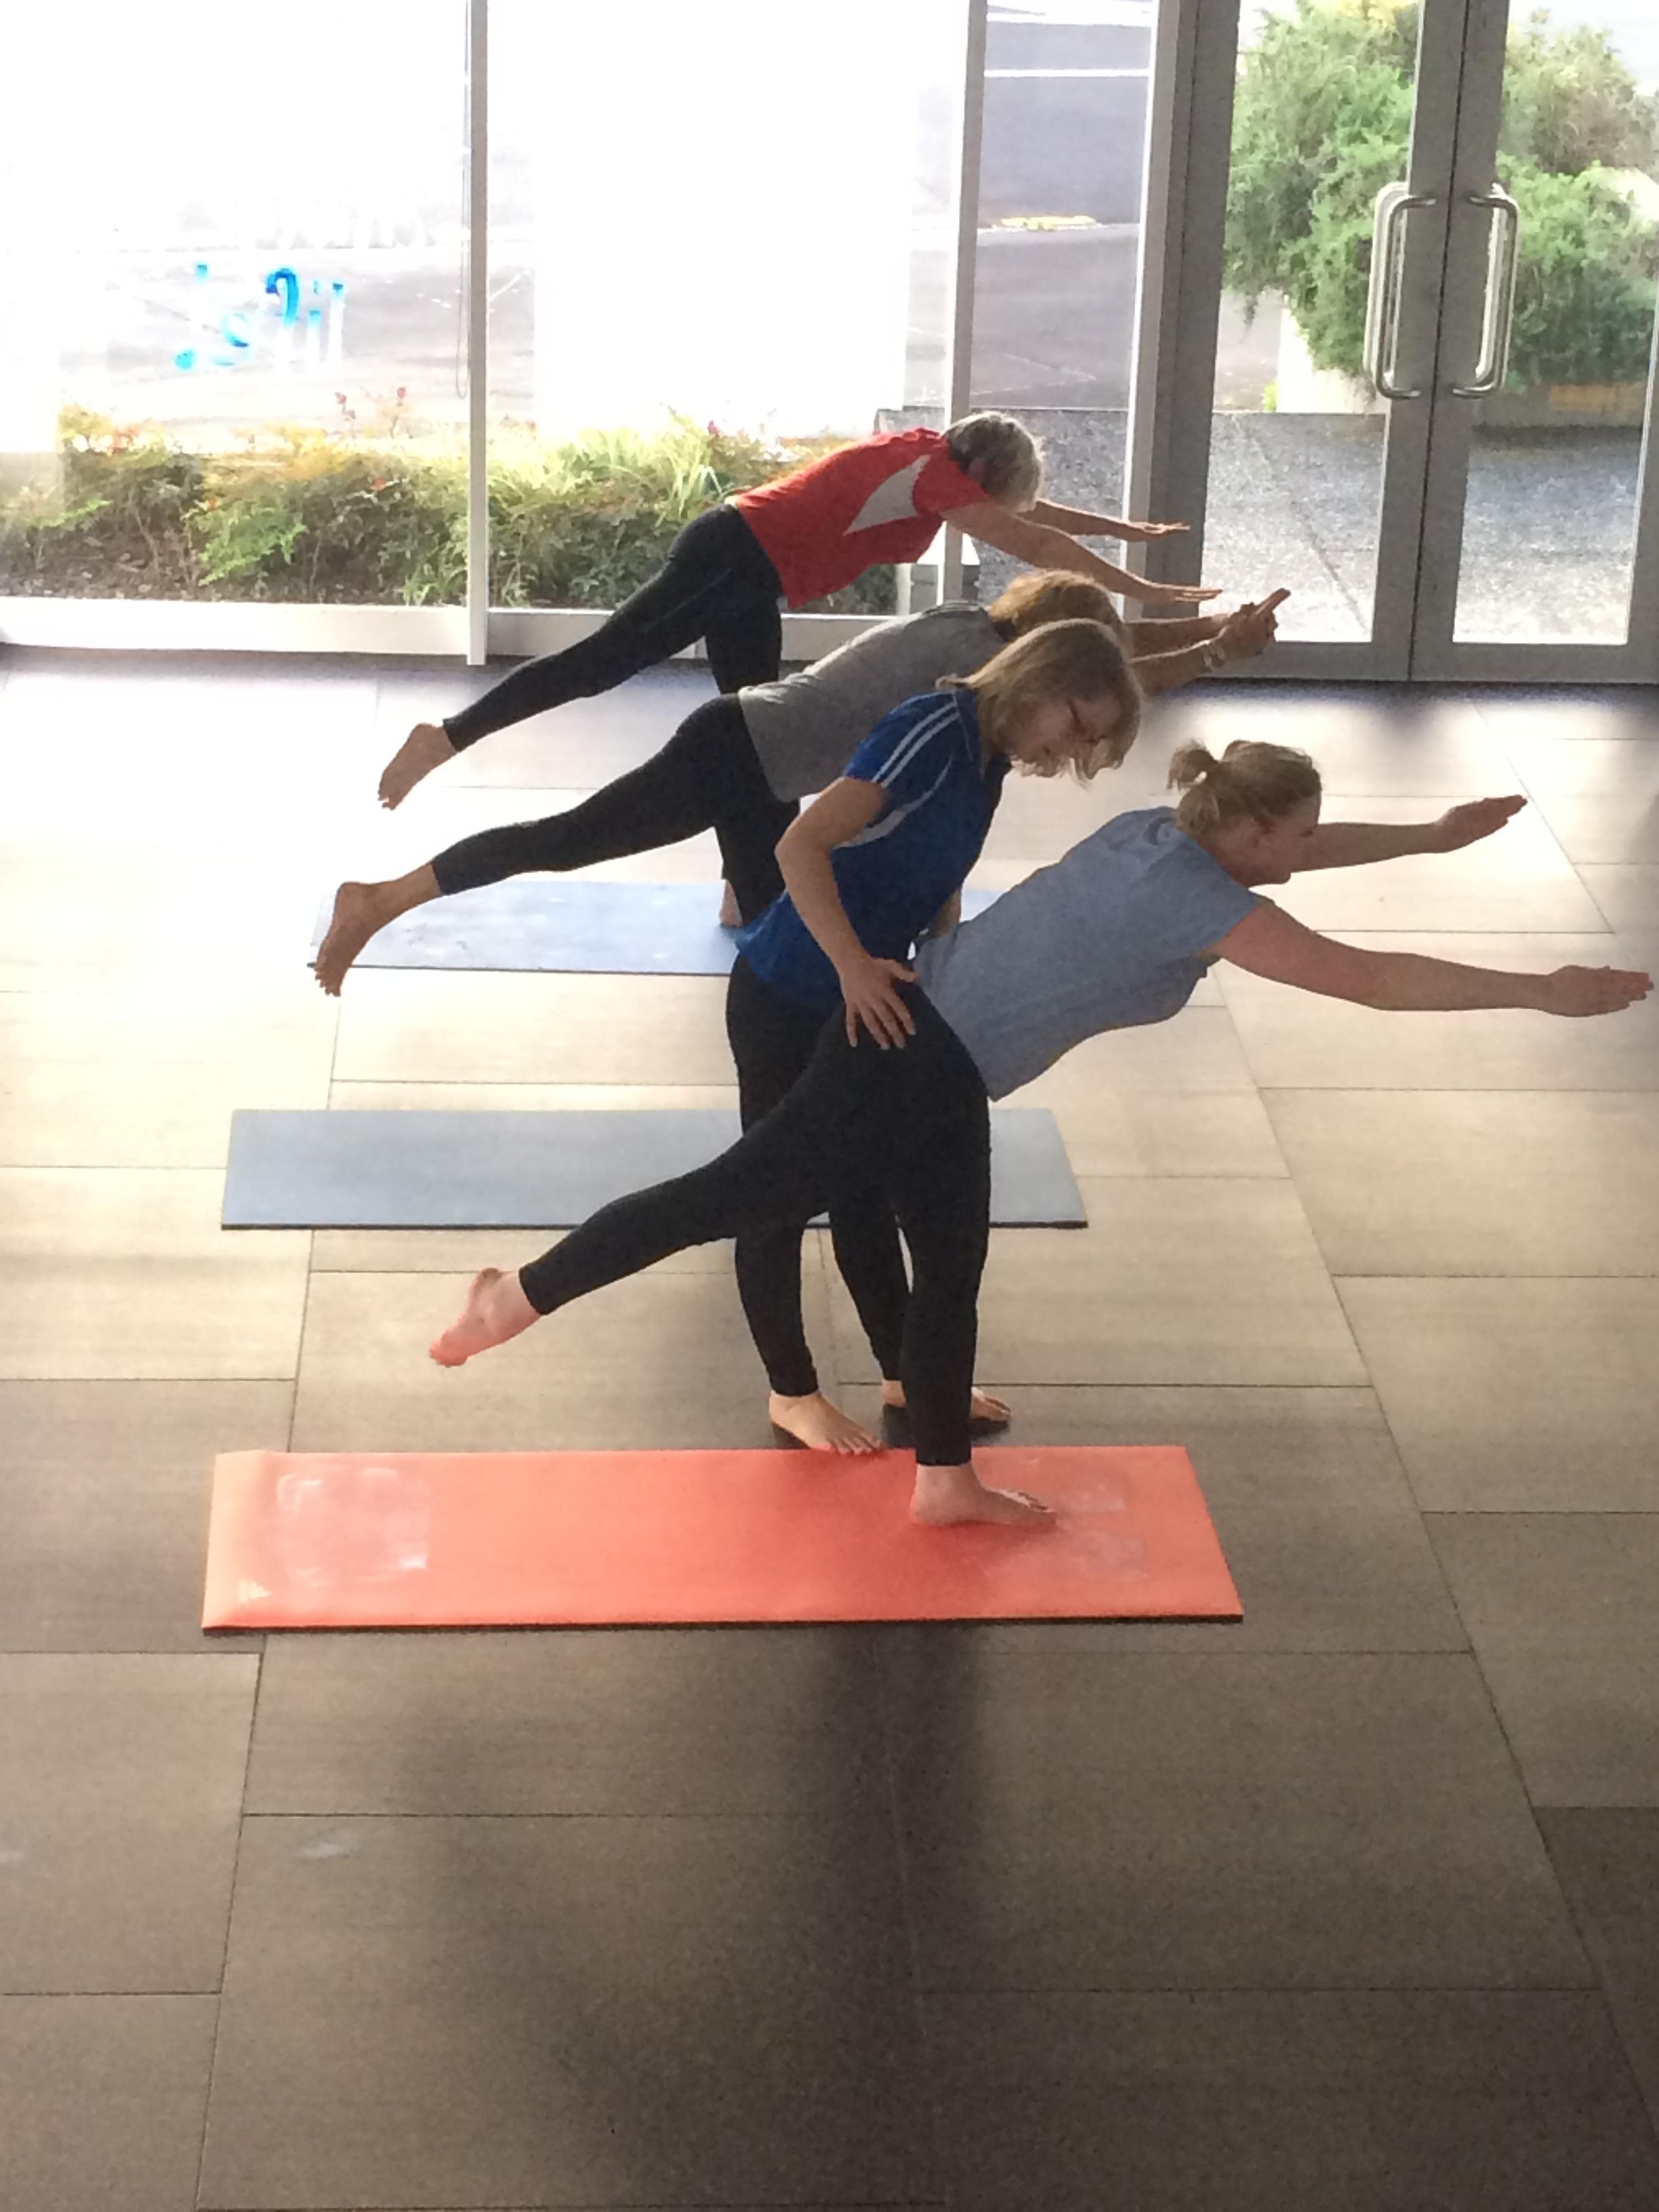 Yoga-theactivelifestylestudiomteden-warrior3.JPG